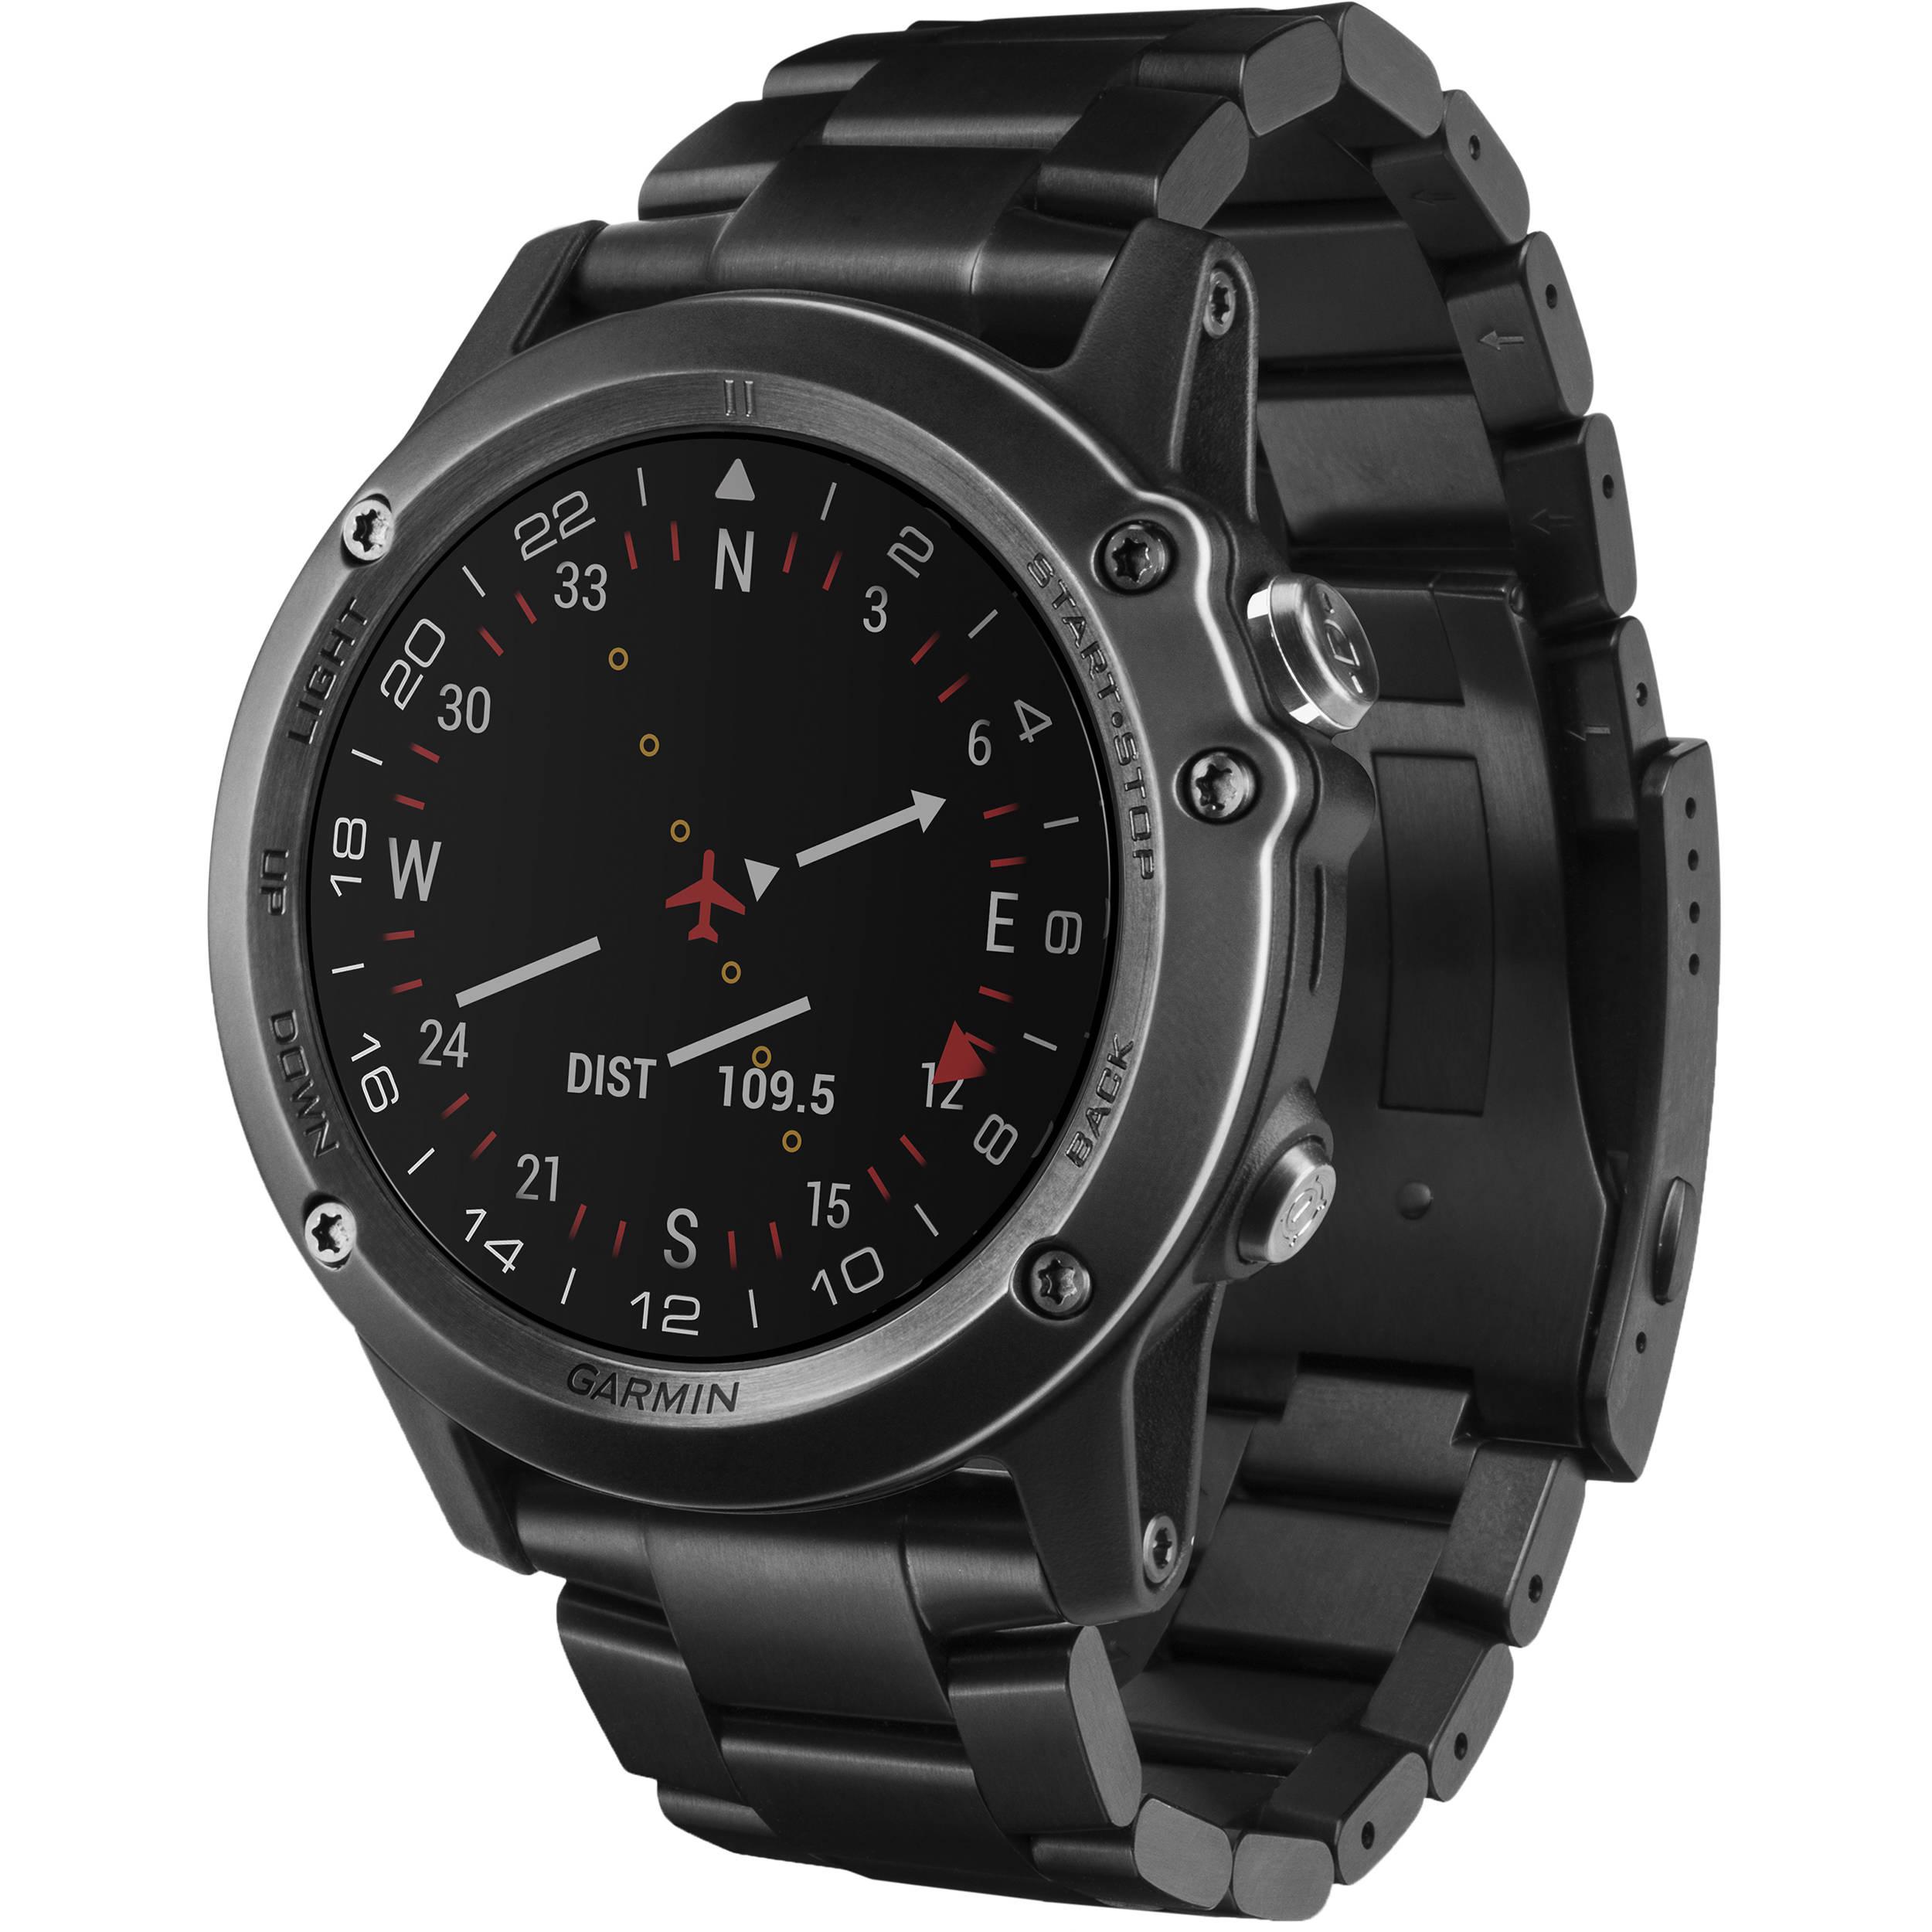 4f7d4c6f935 Garmin D2 Bravo GPS Aviator Navigation Watch 010-01338-36 B H